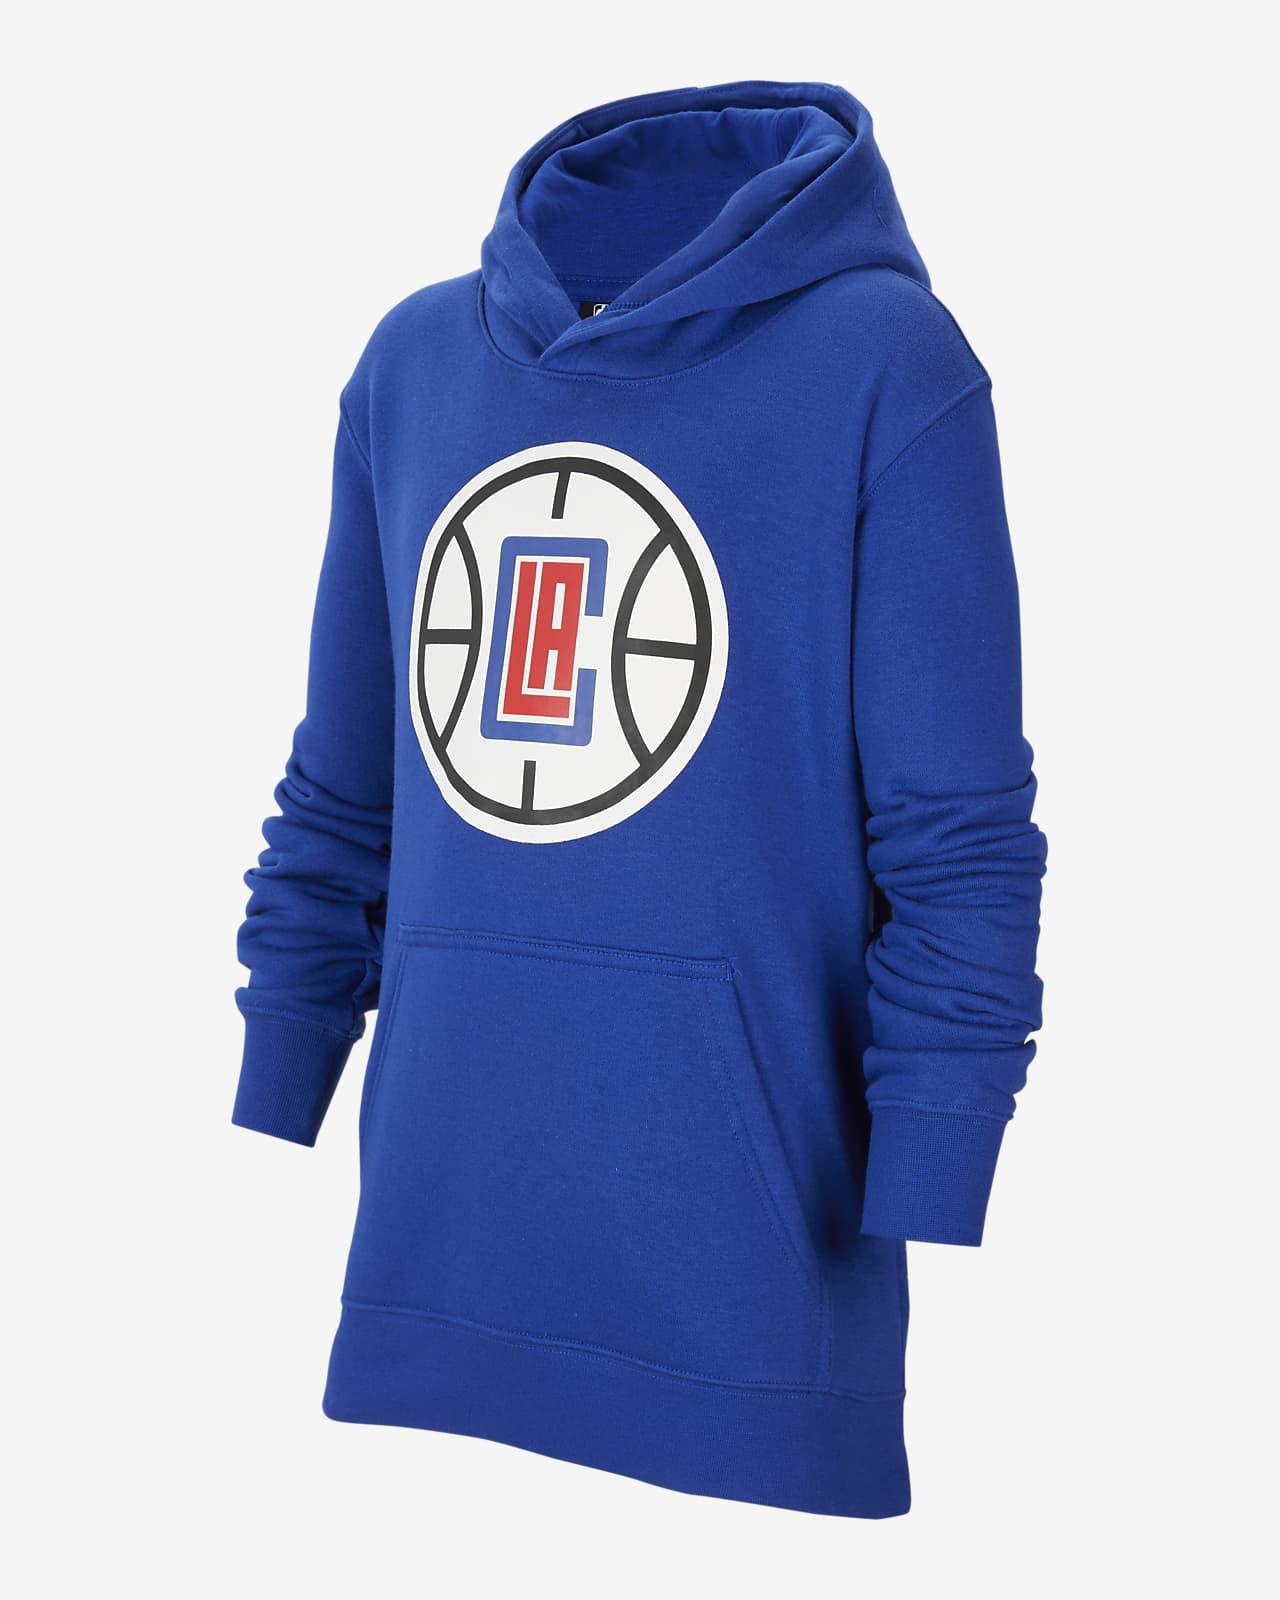 LA Clippers Essential Nike NBA-Hoodie für ältere Kinder